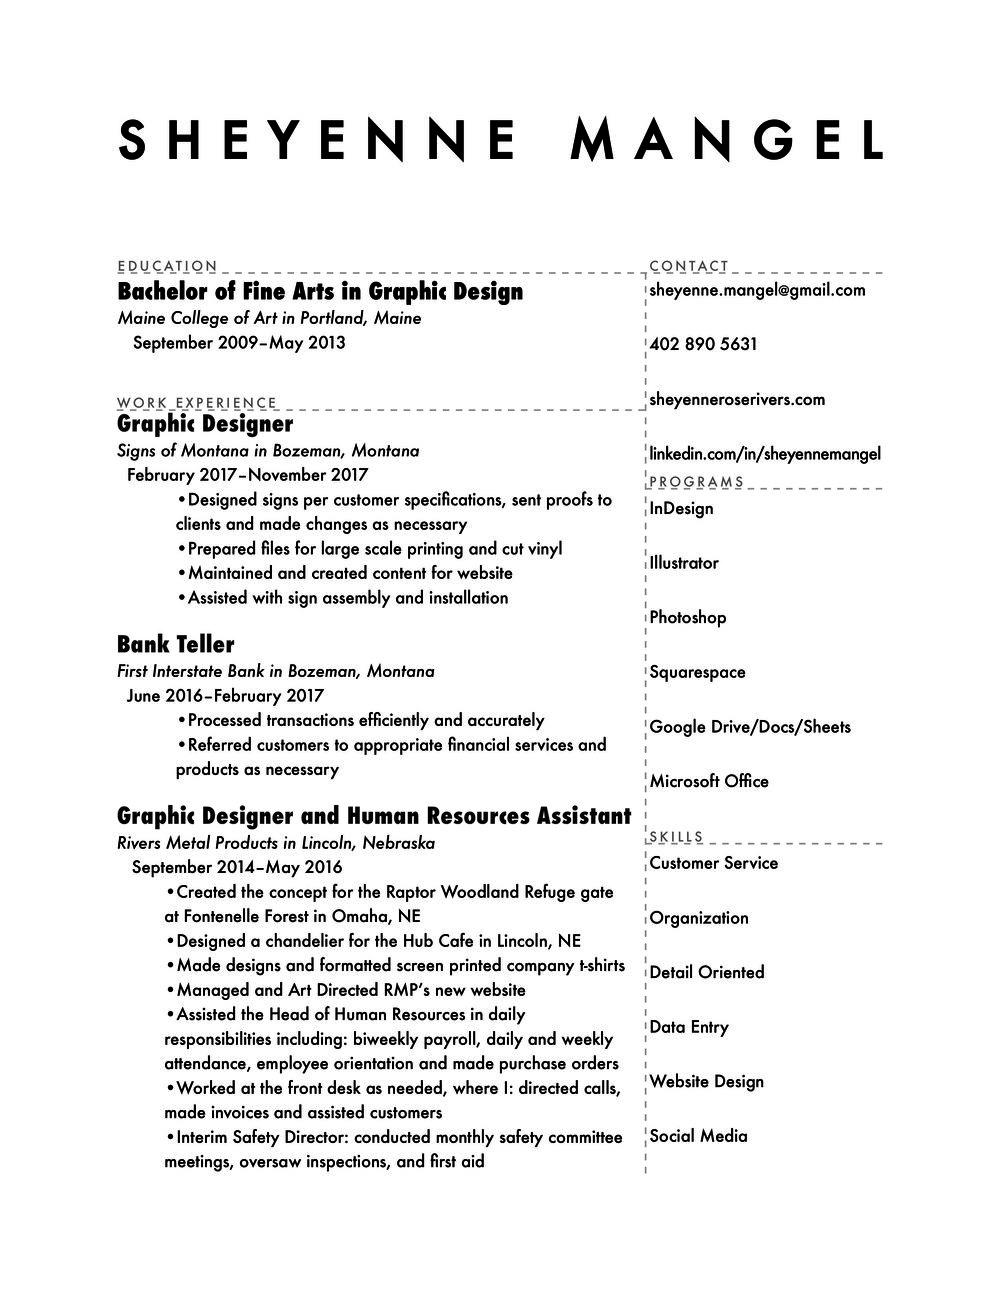 resume Sheyenne Mangel